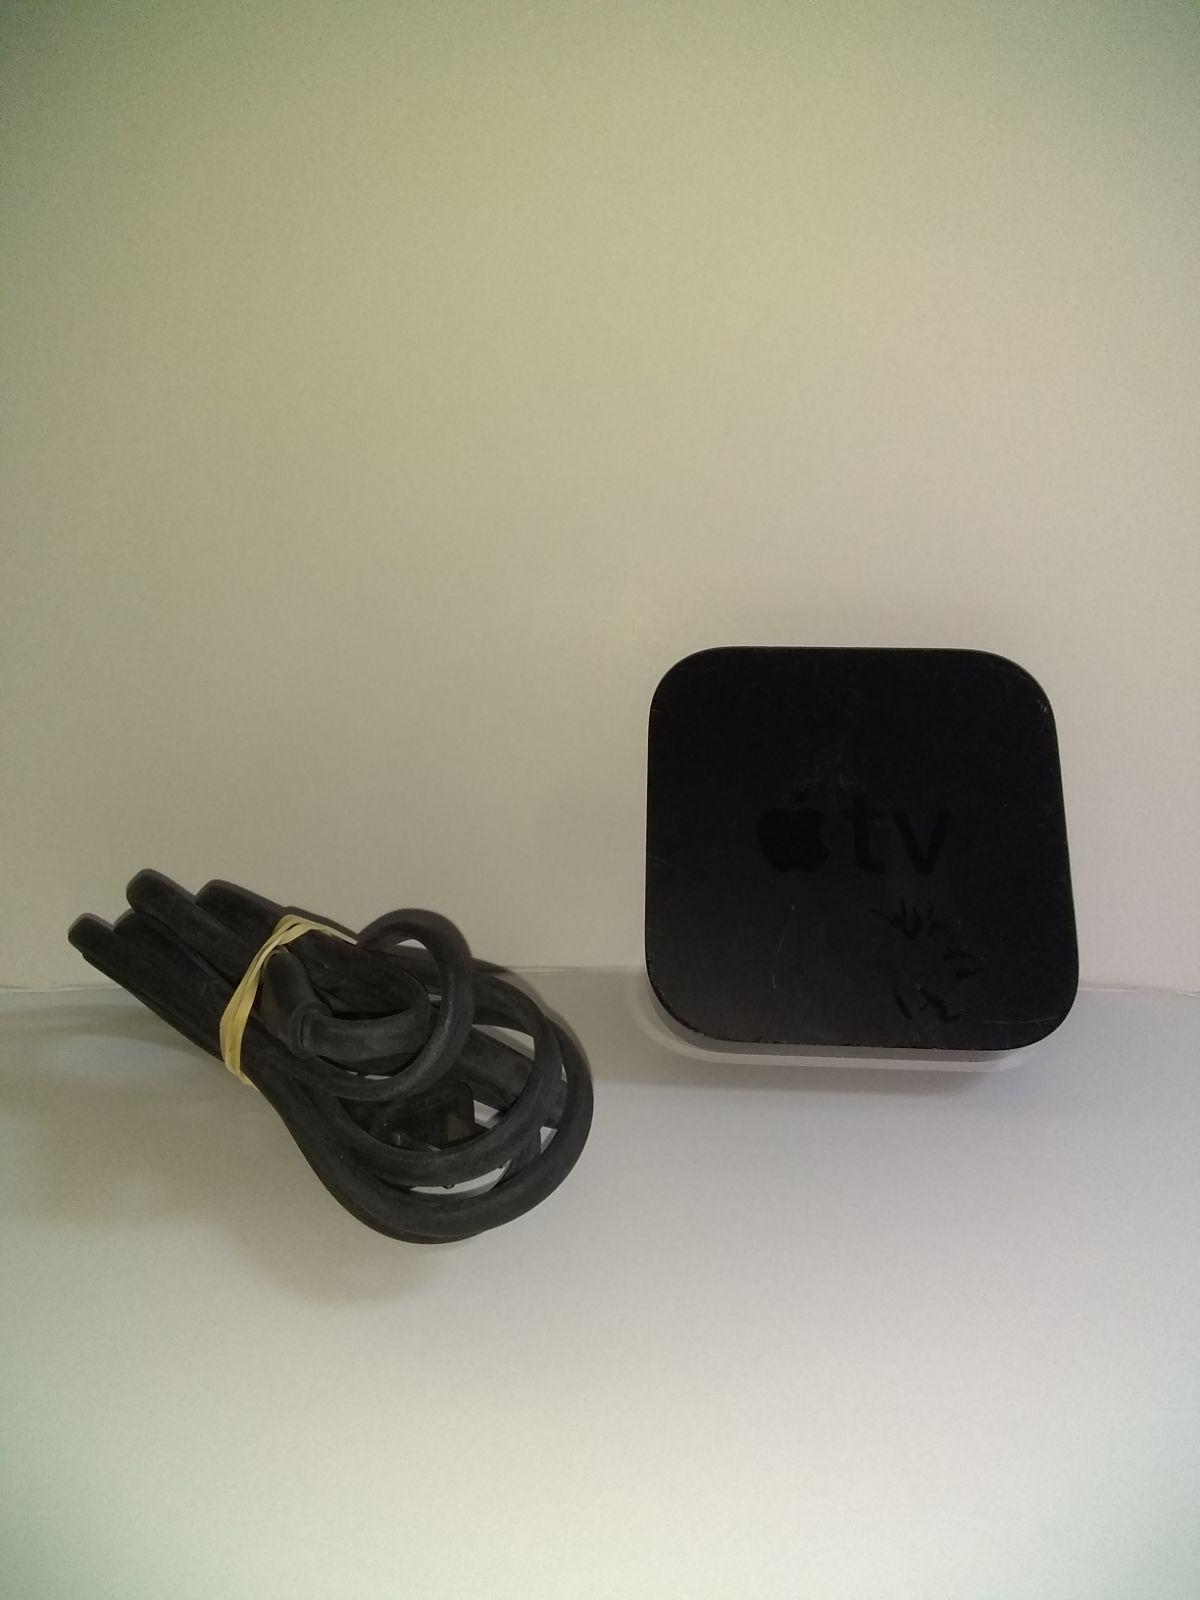 Apple Tv 2nd Generation Mercari Apple Tv Hdmi Cord Generation